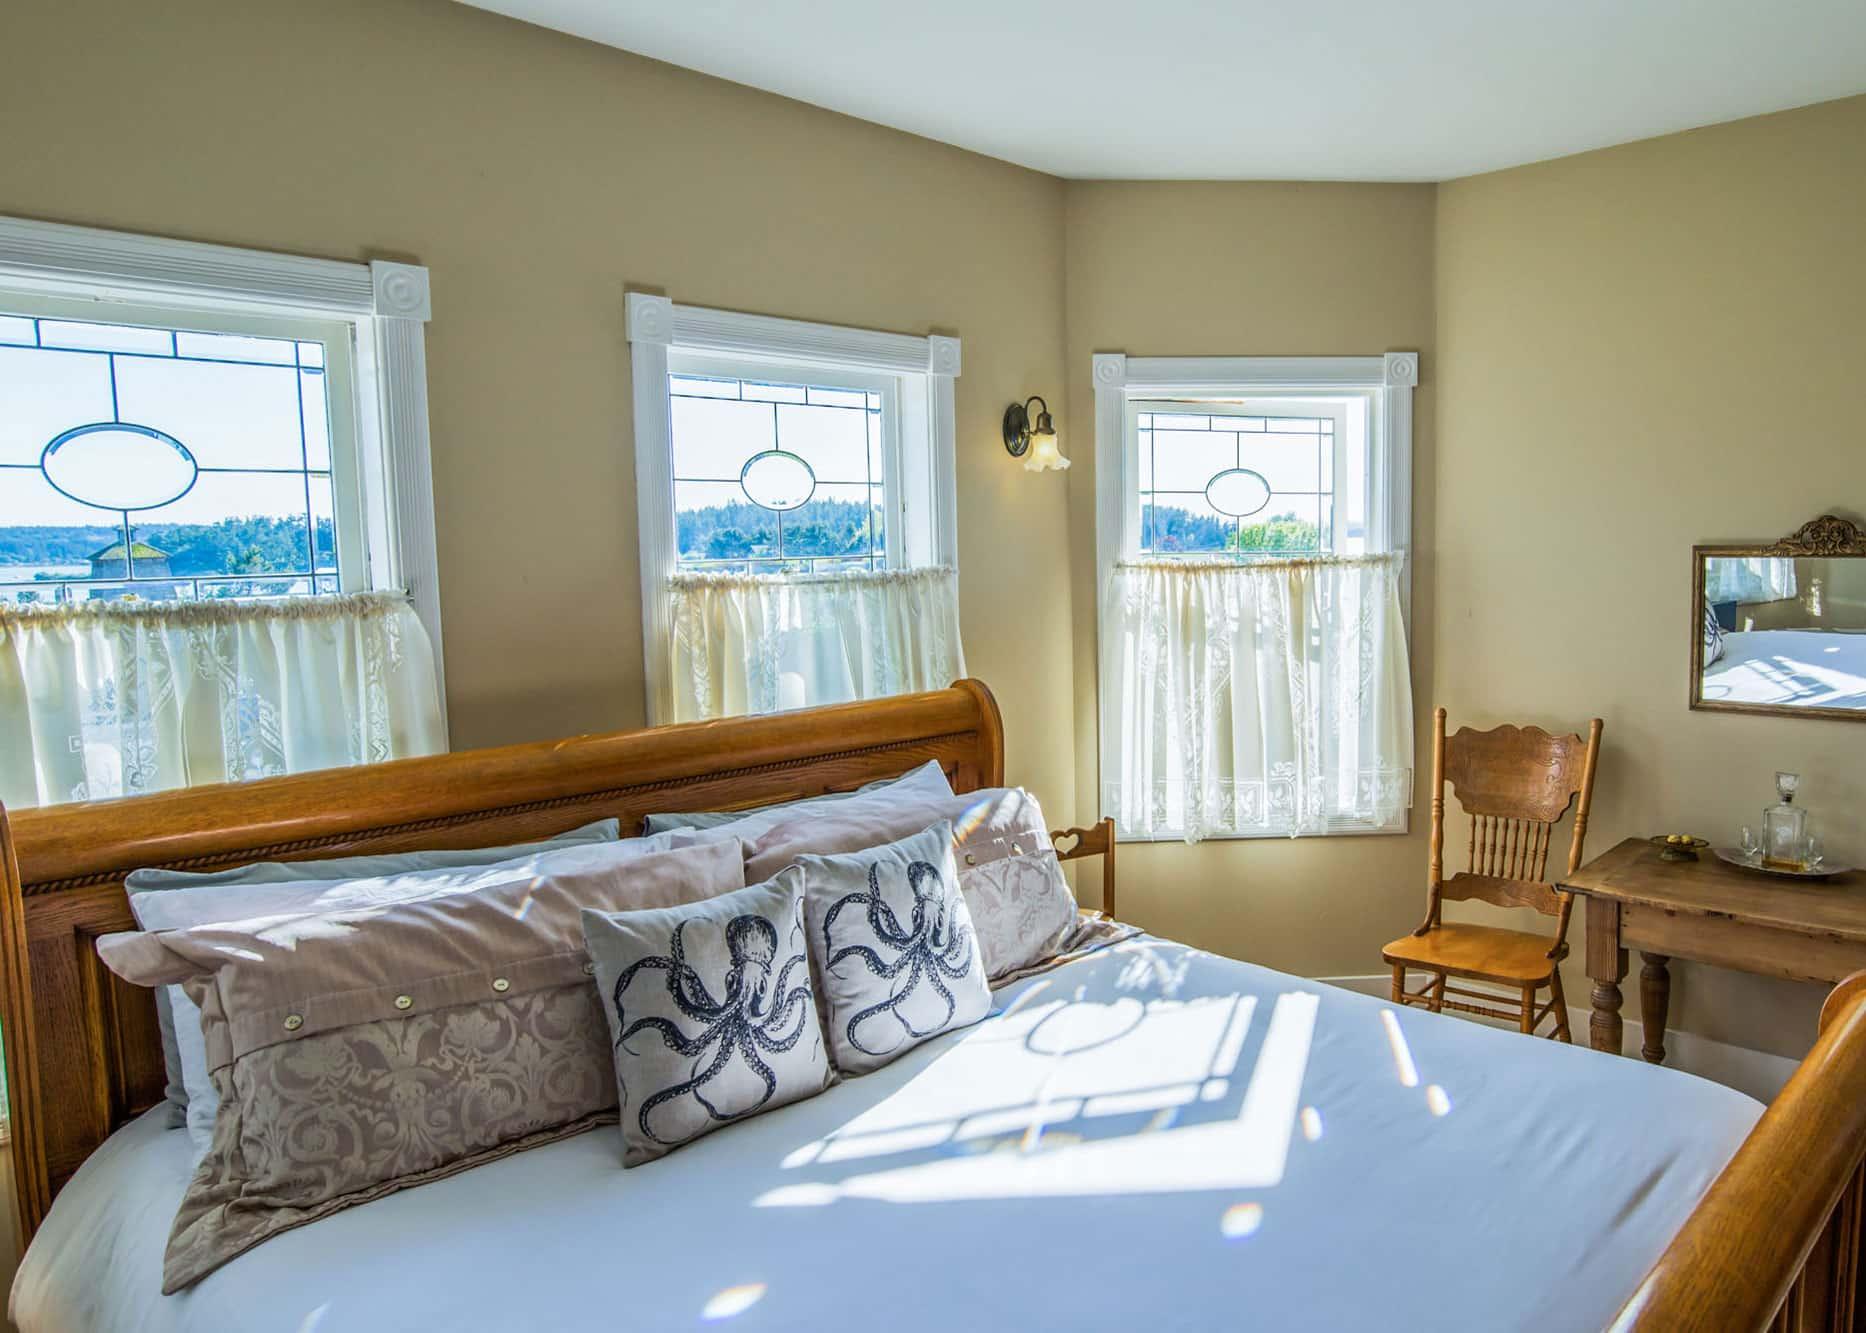 the-edenwild-inn-lopez-island-lodging-2020-room-06-02